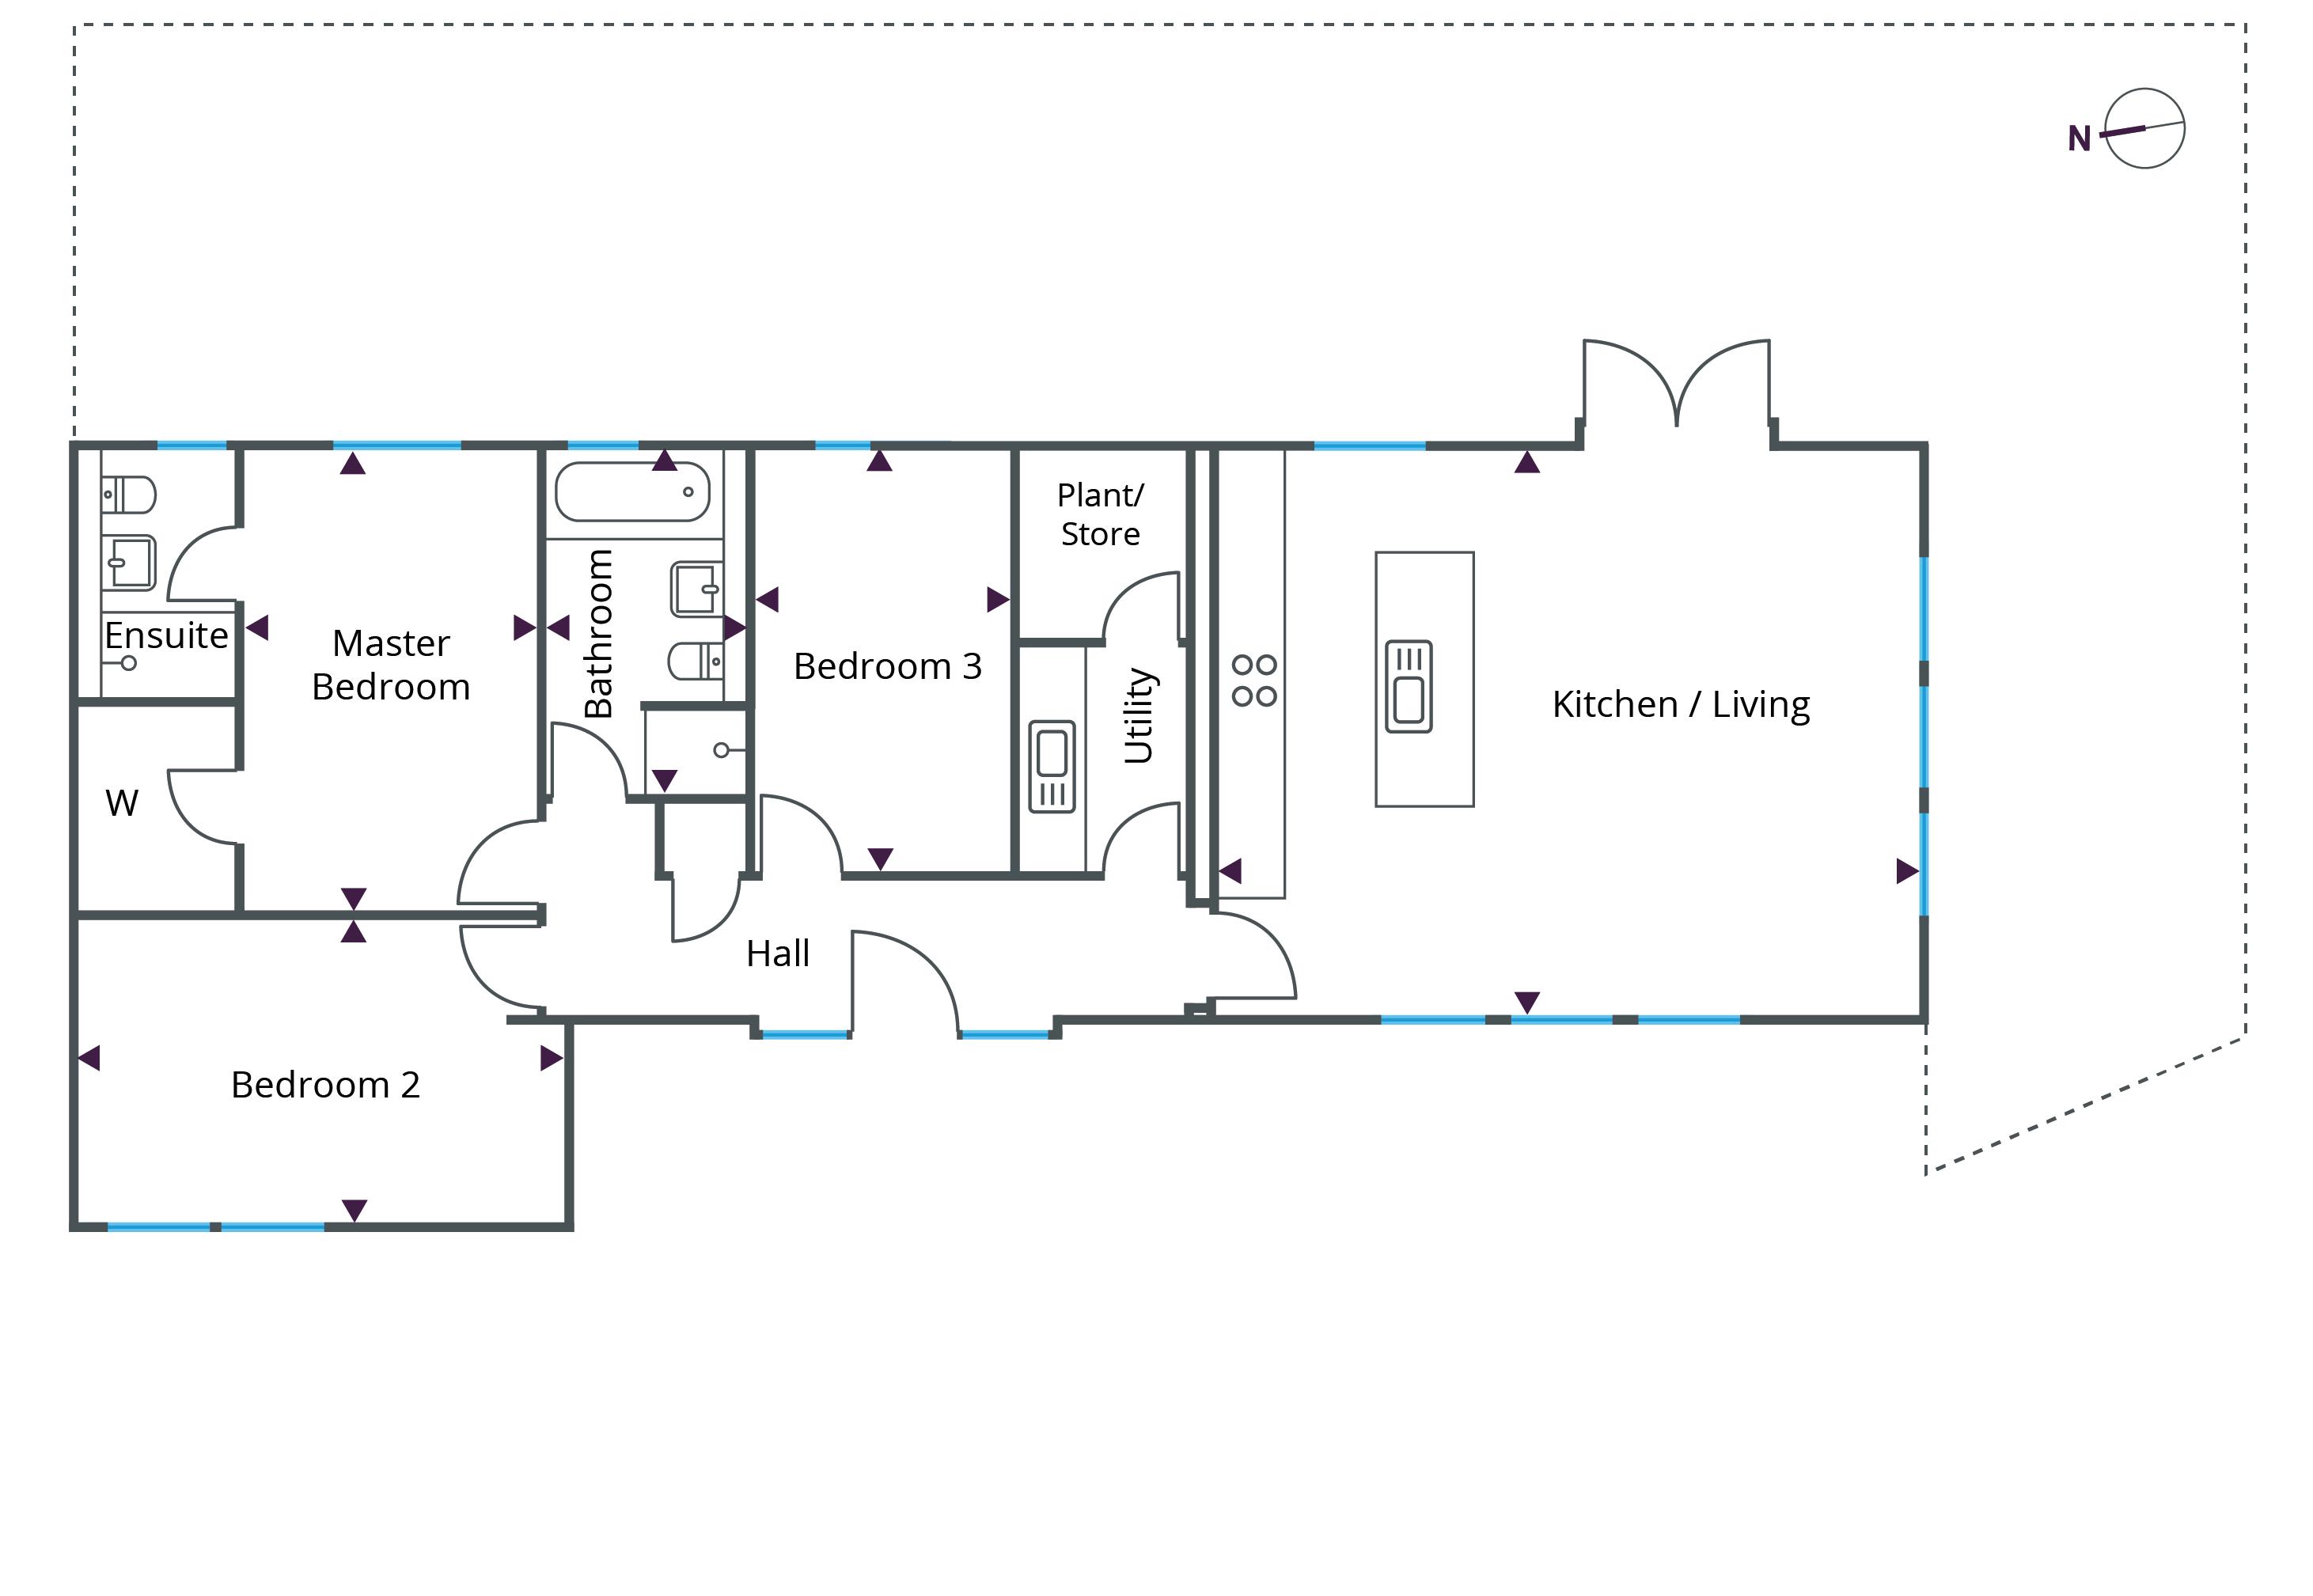 Floorplan for Bungalow 5